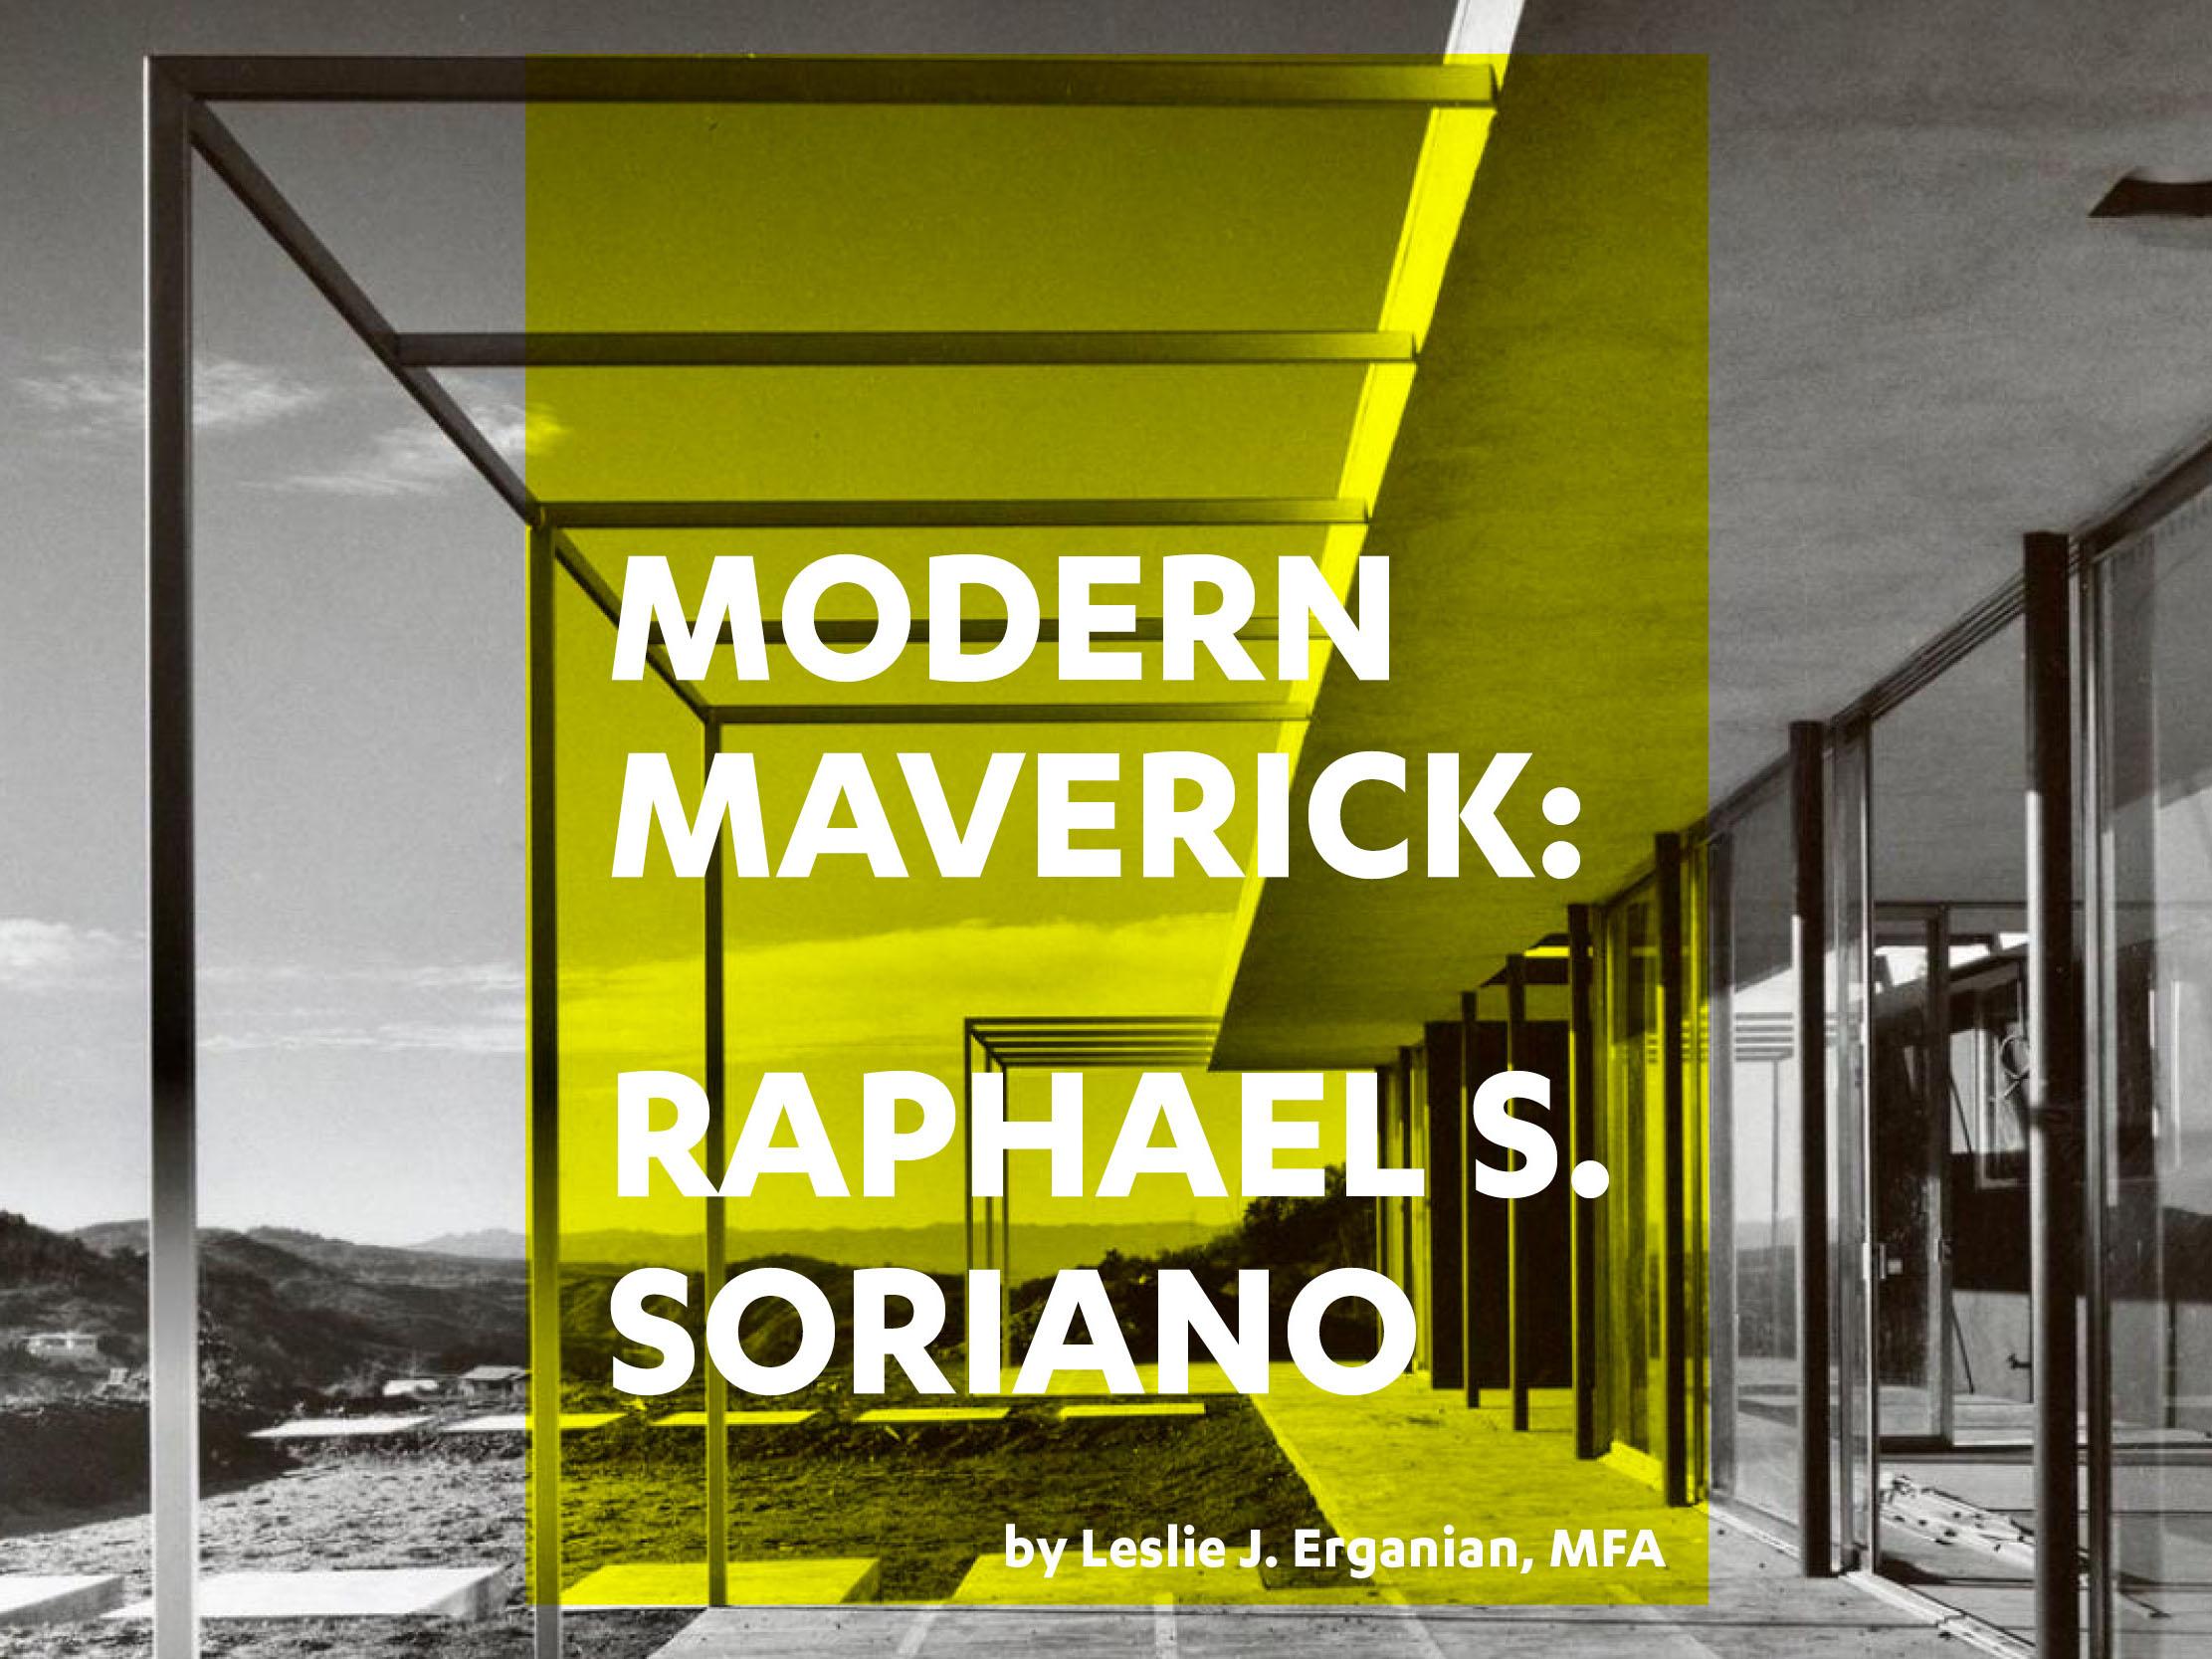 Modern Maverick: Raphael S. Soriano